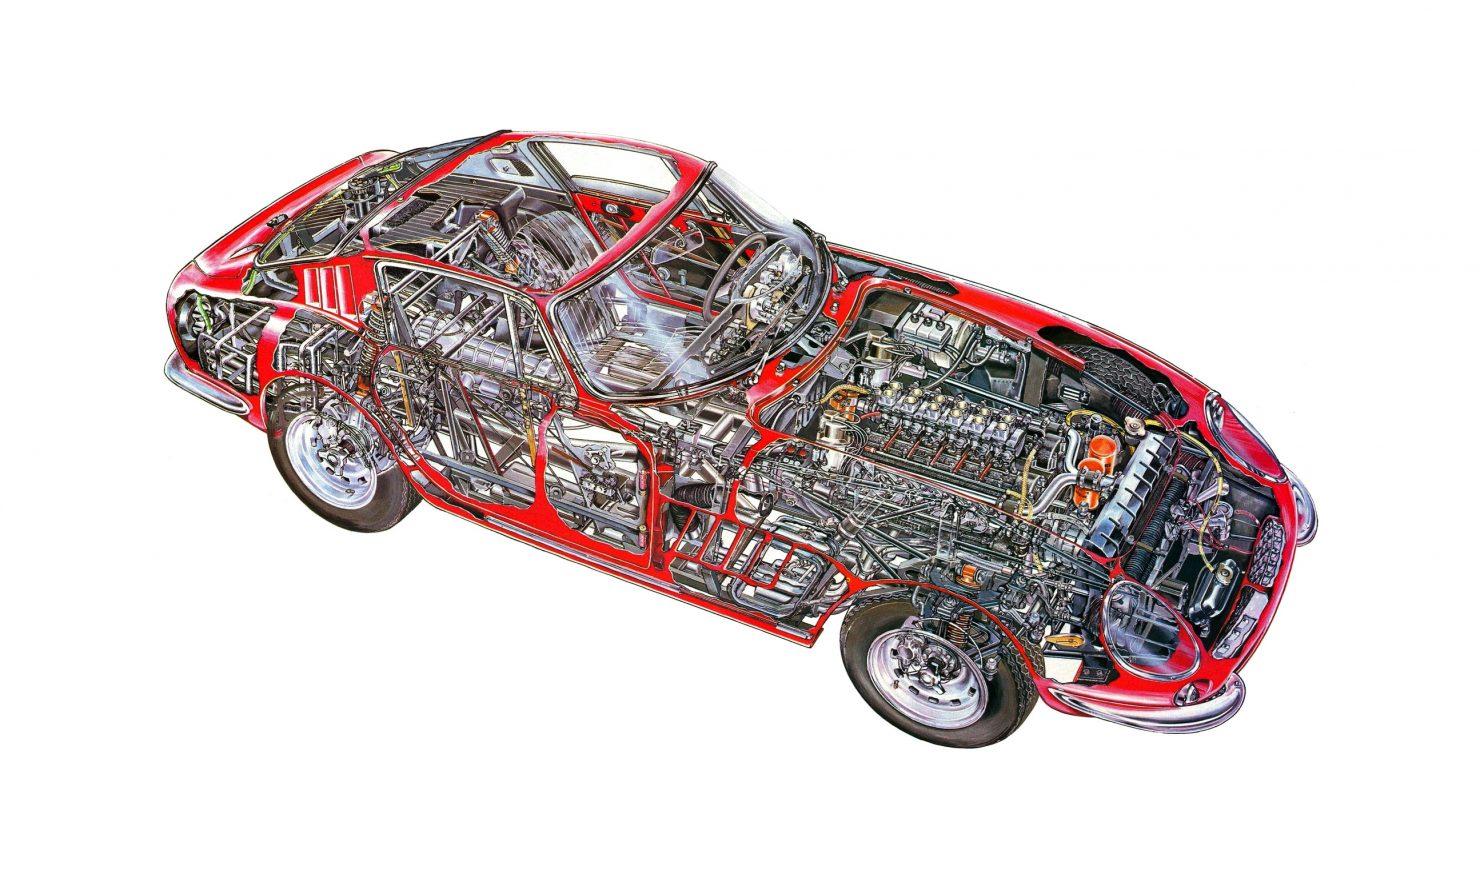 Ferrari 275 GTB Chassis Body Engine Cutaway 1480x878 - 1965 Ferrari 275 GTB/6C Alloy